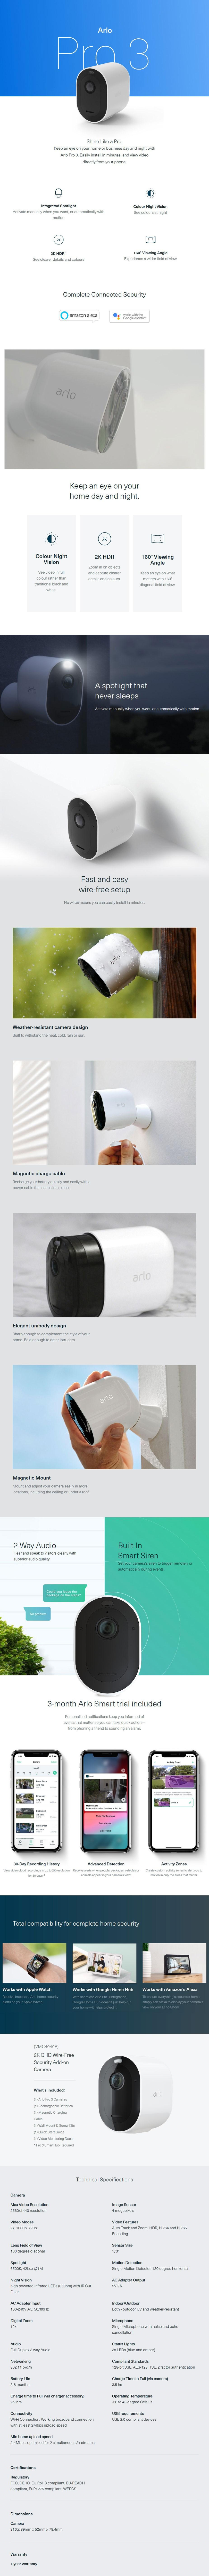 arlo-pro-3-indooroutdoor-wirefree-2k-qhd-security-addon-camera-ac28847-4.jpg